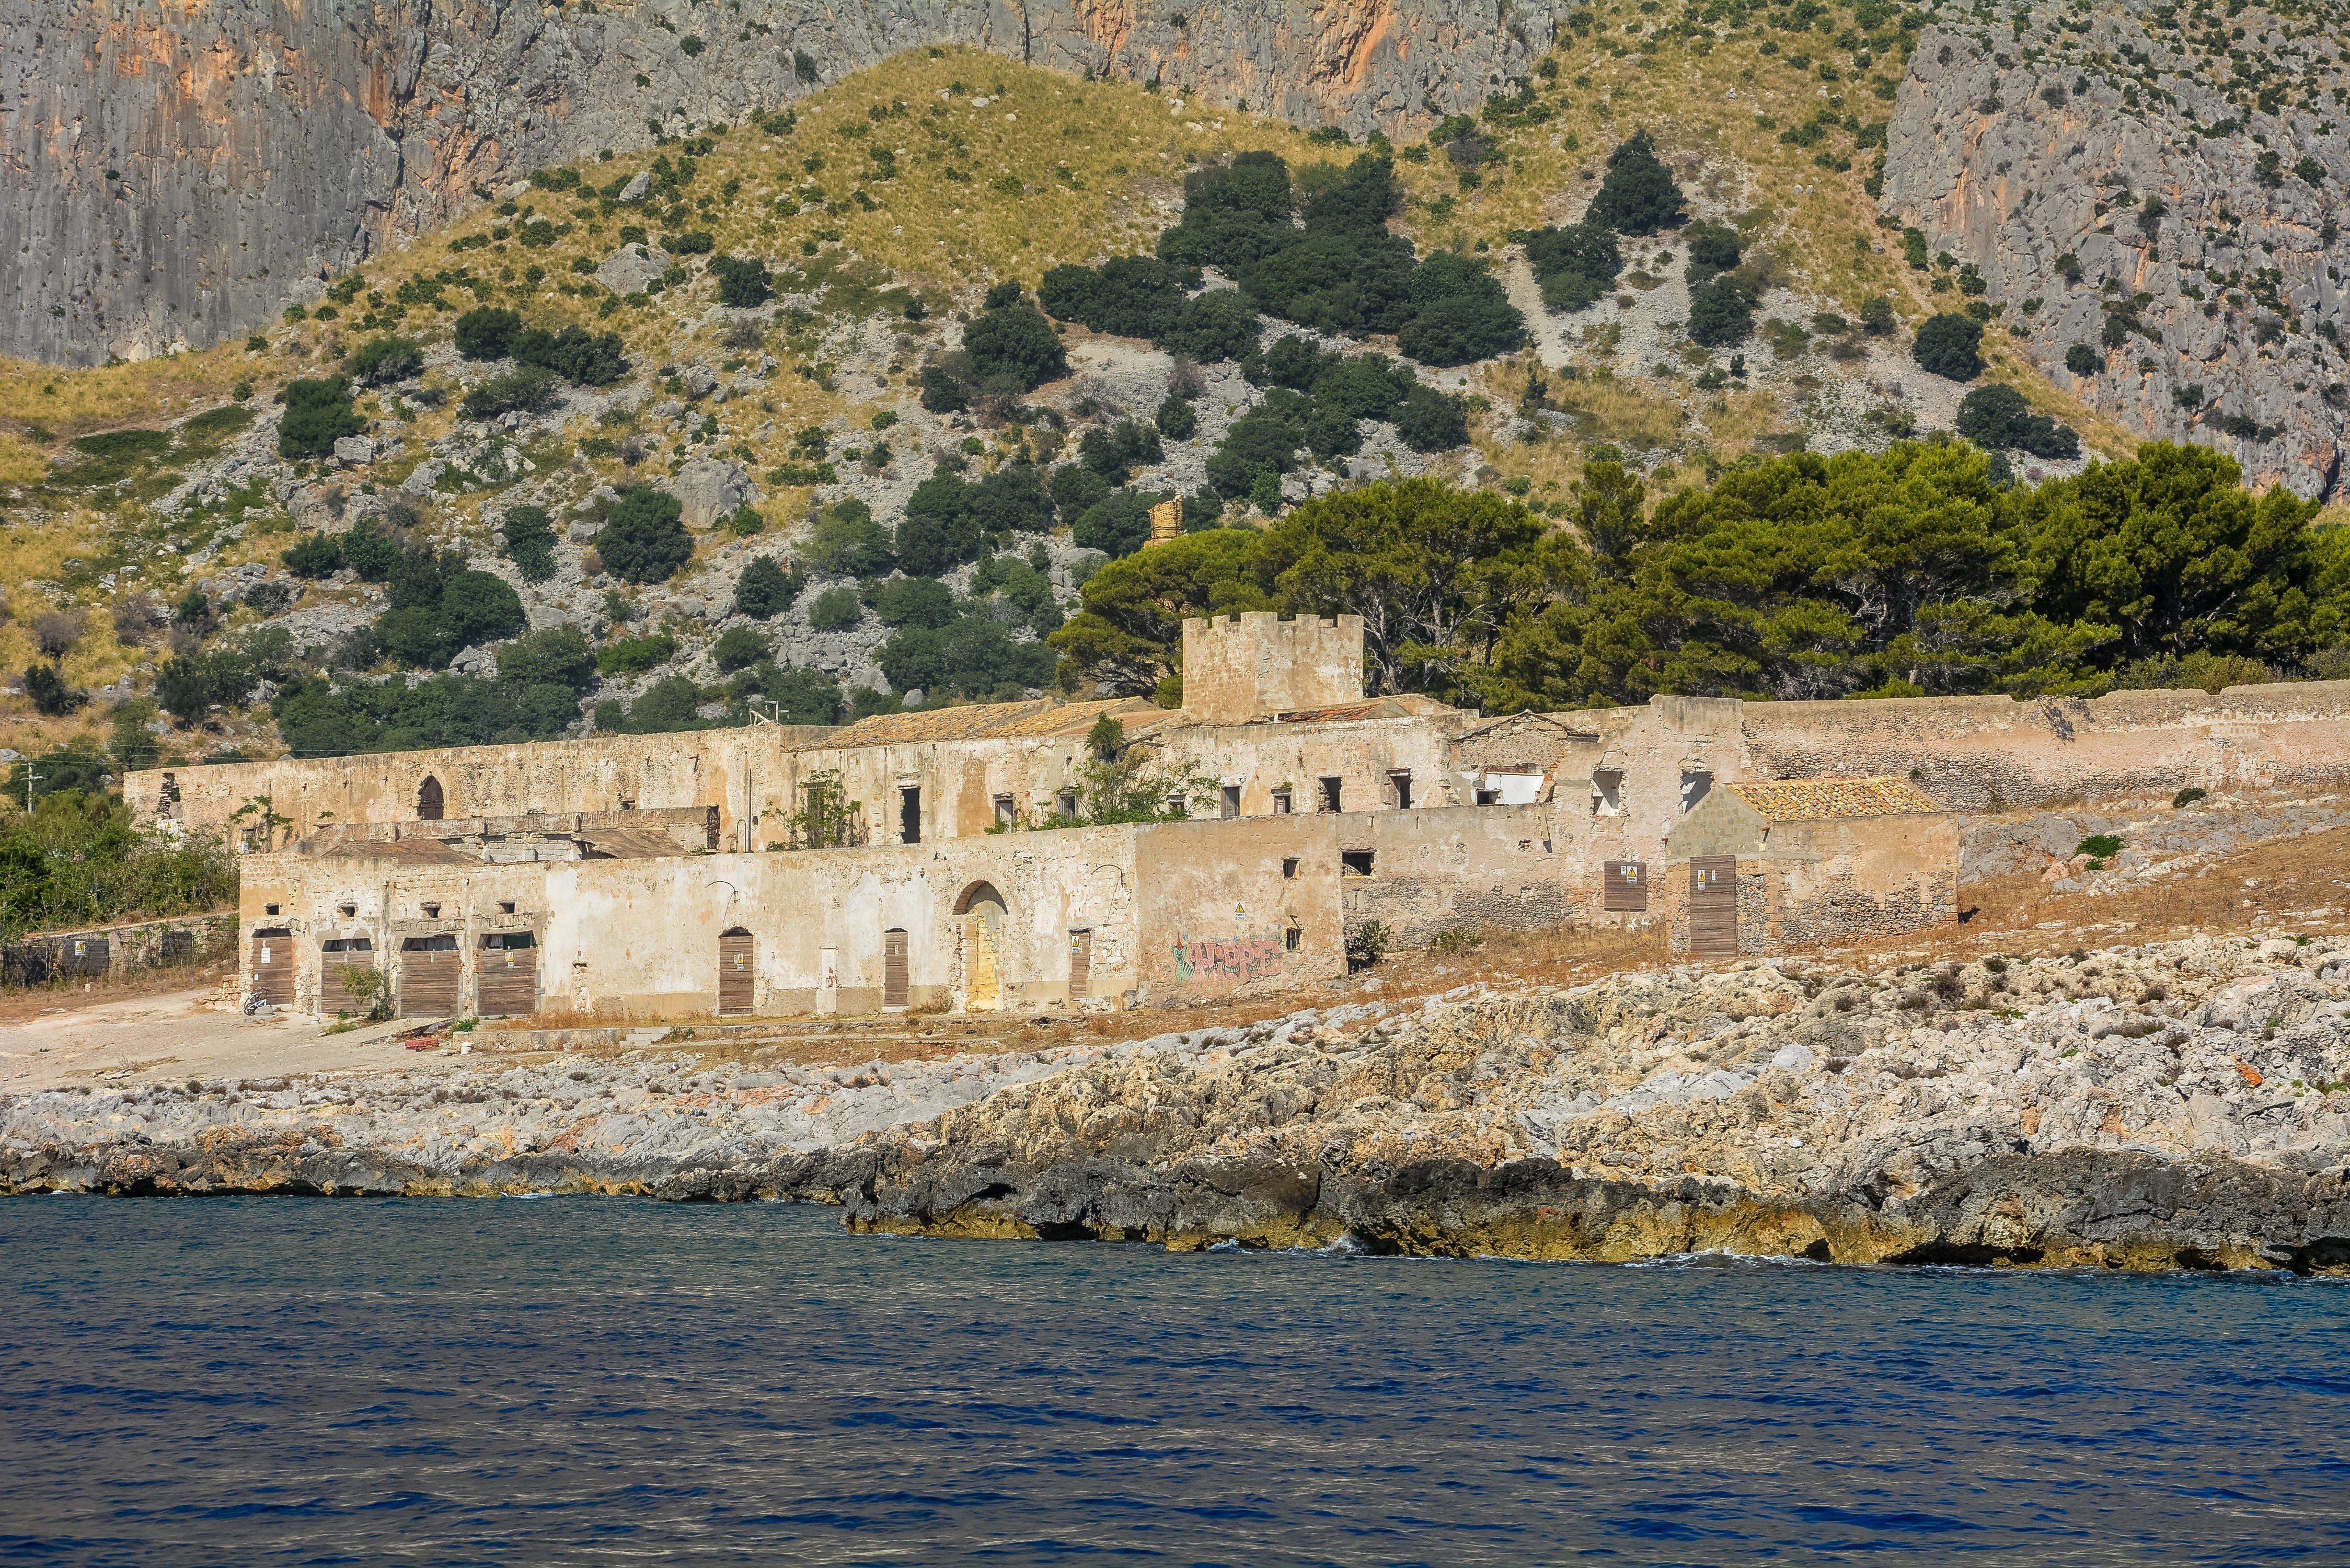 san vito lo capo tonnara del secco abandoned urbex lost places italy sicily ocean view